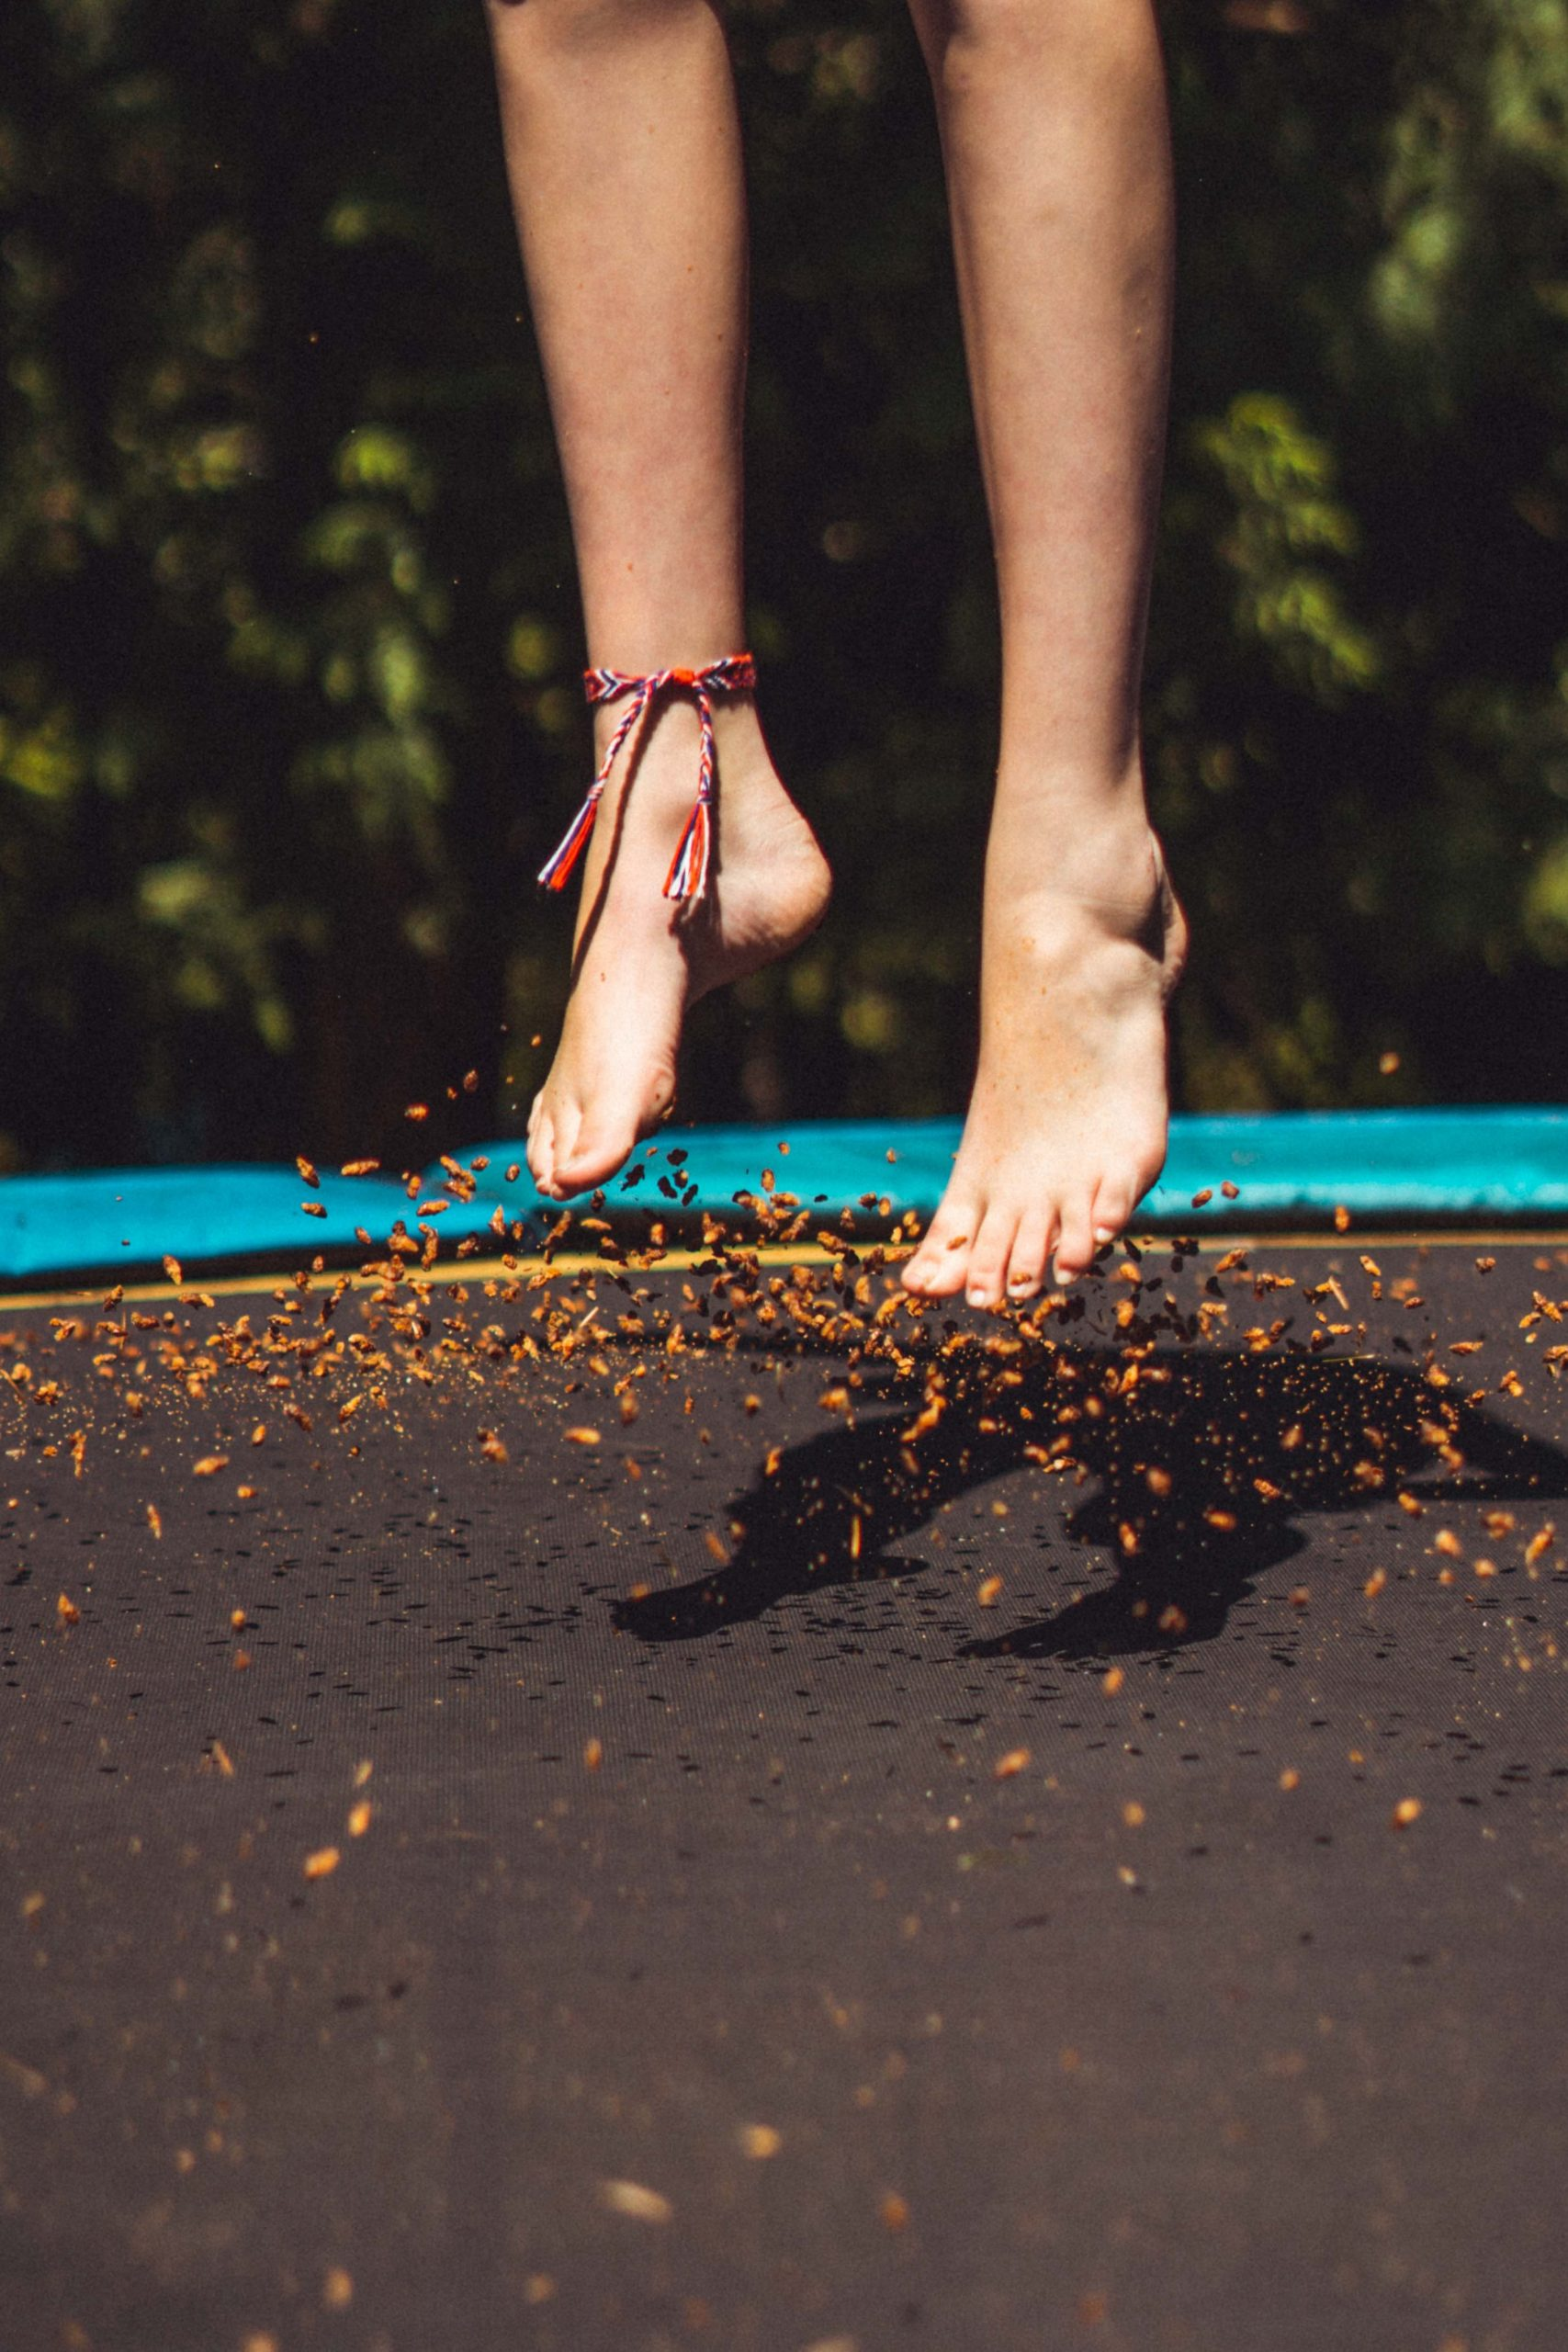 dansend trampoline springen jumping fitness